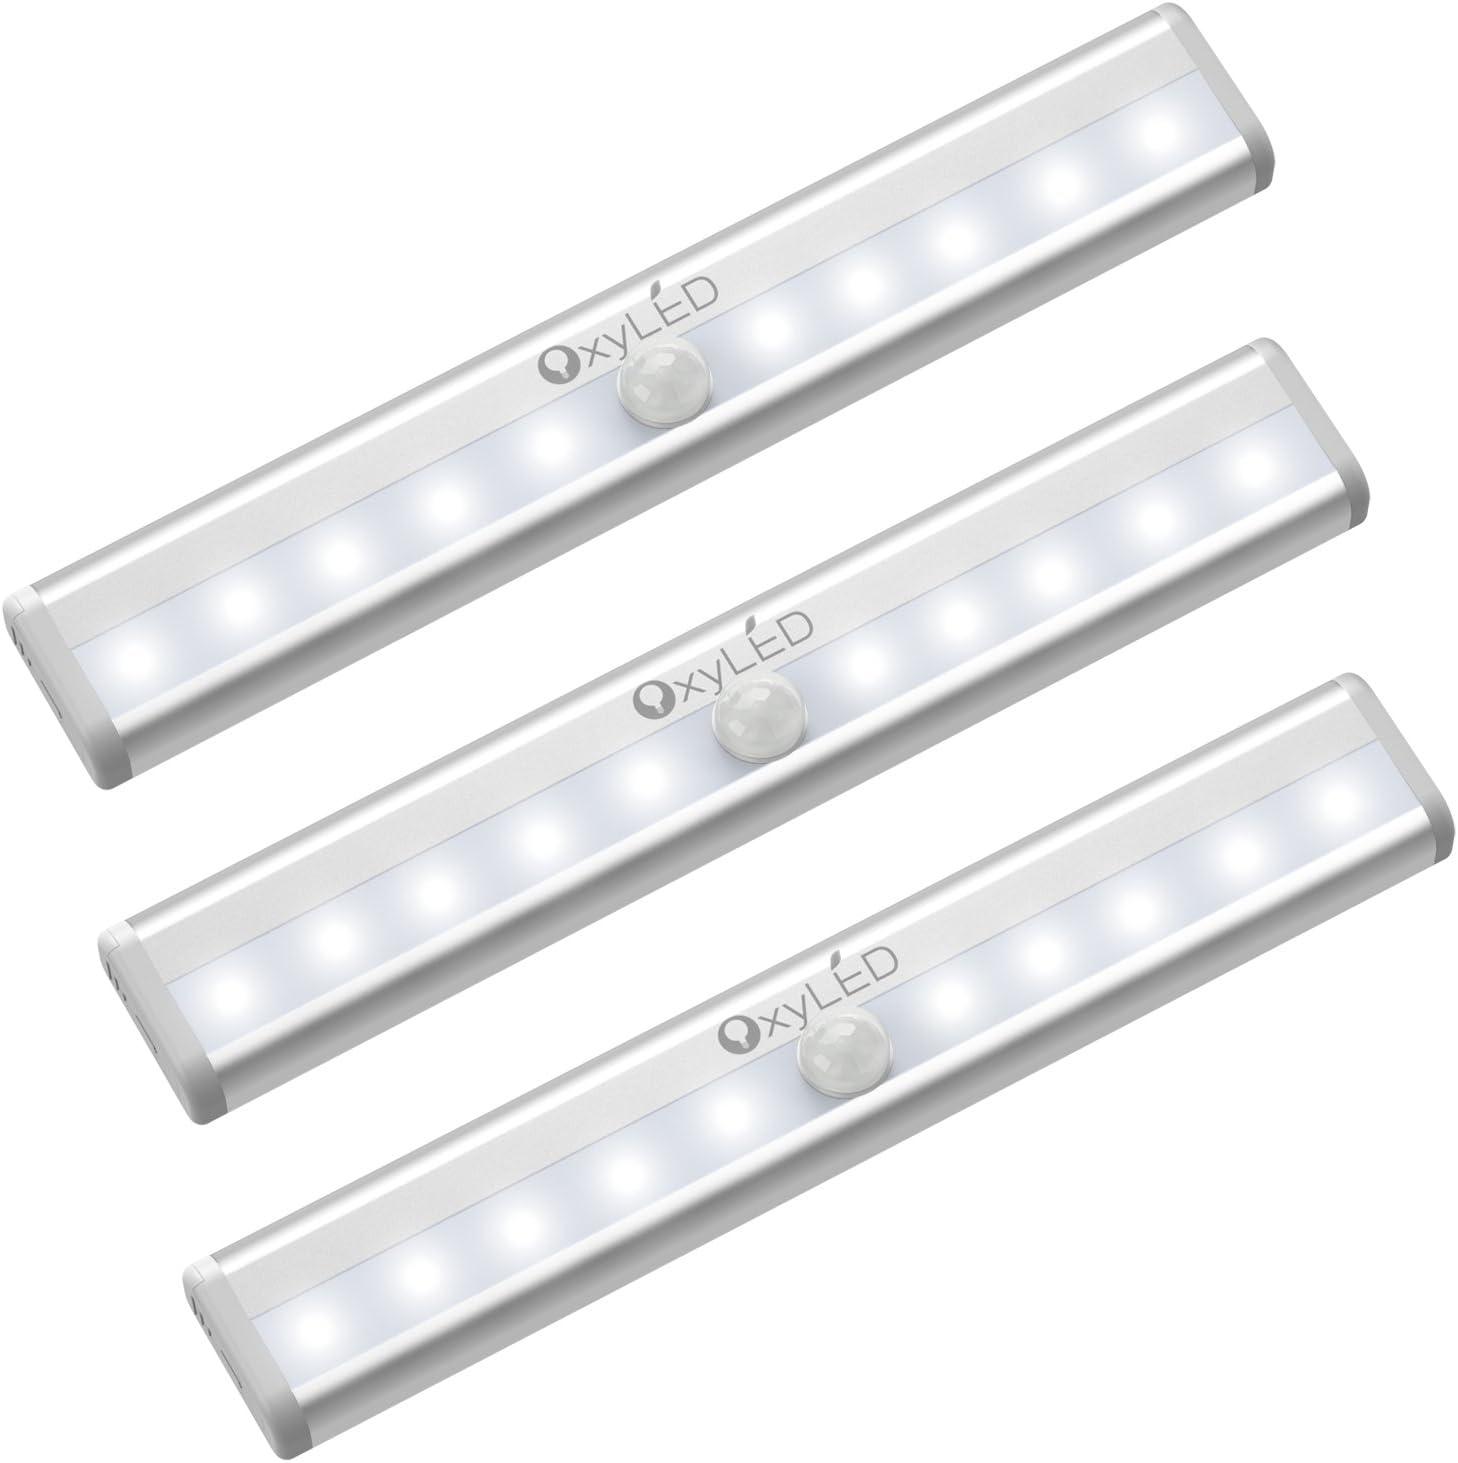 luces de armario OxyLED,Luz de un toque con adhesivo para pegar en cualquier luga con sensor LED nocturno,Funciona con bater/ía,rotaci/ón 180/° 3Pack Clase de eficiencia energ/ética A